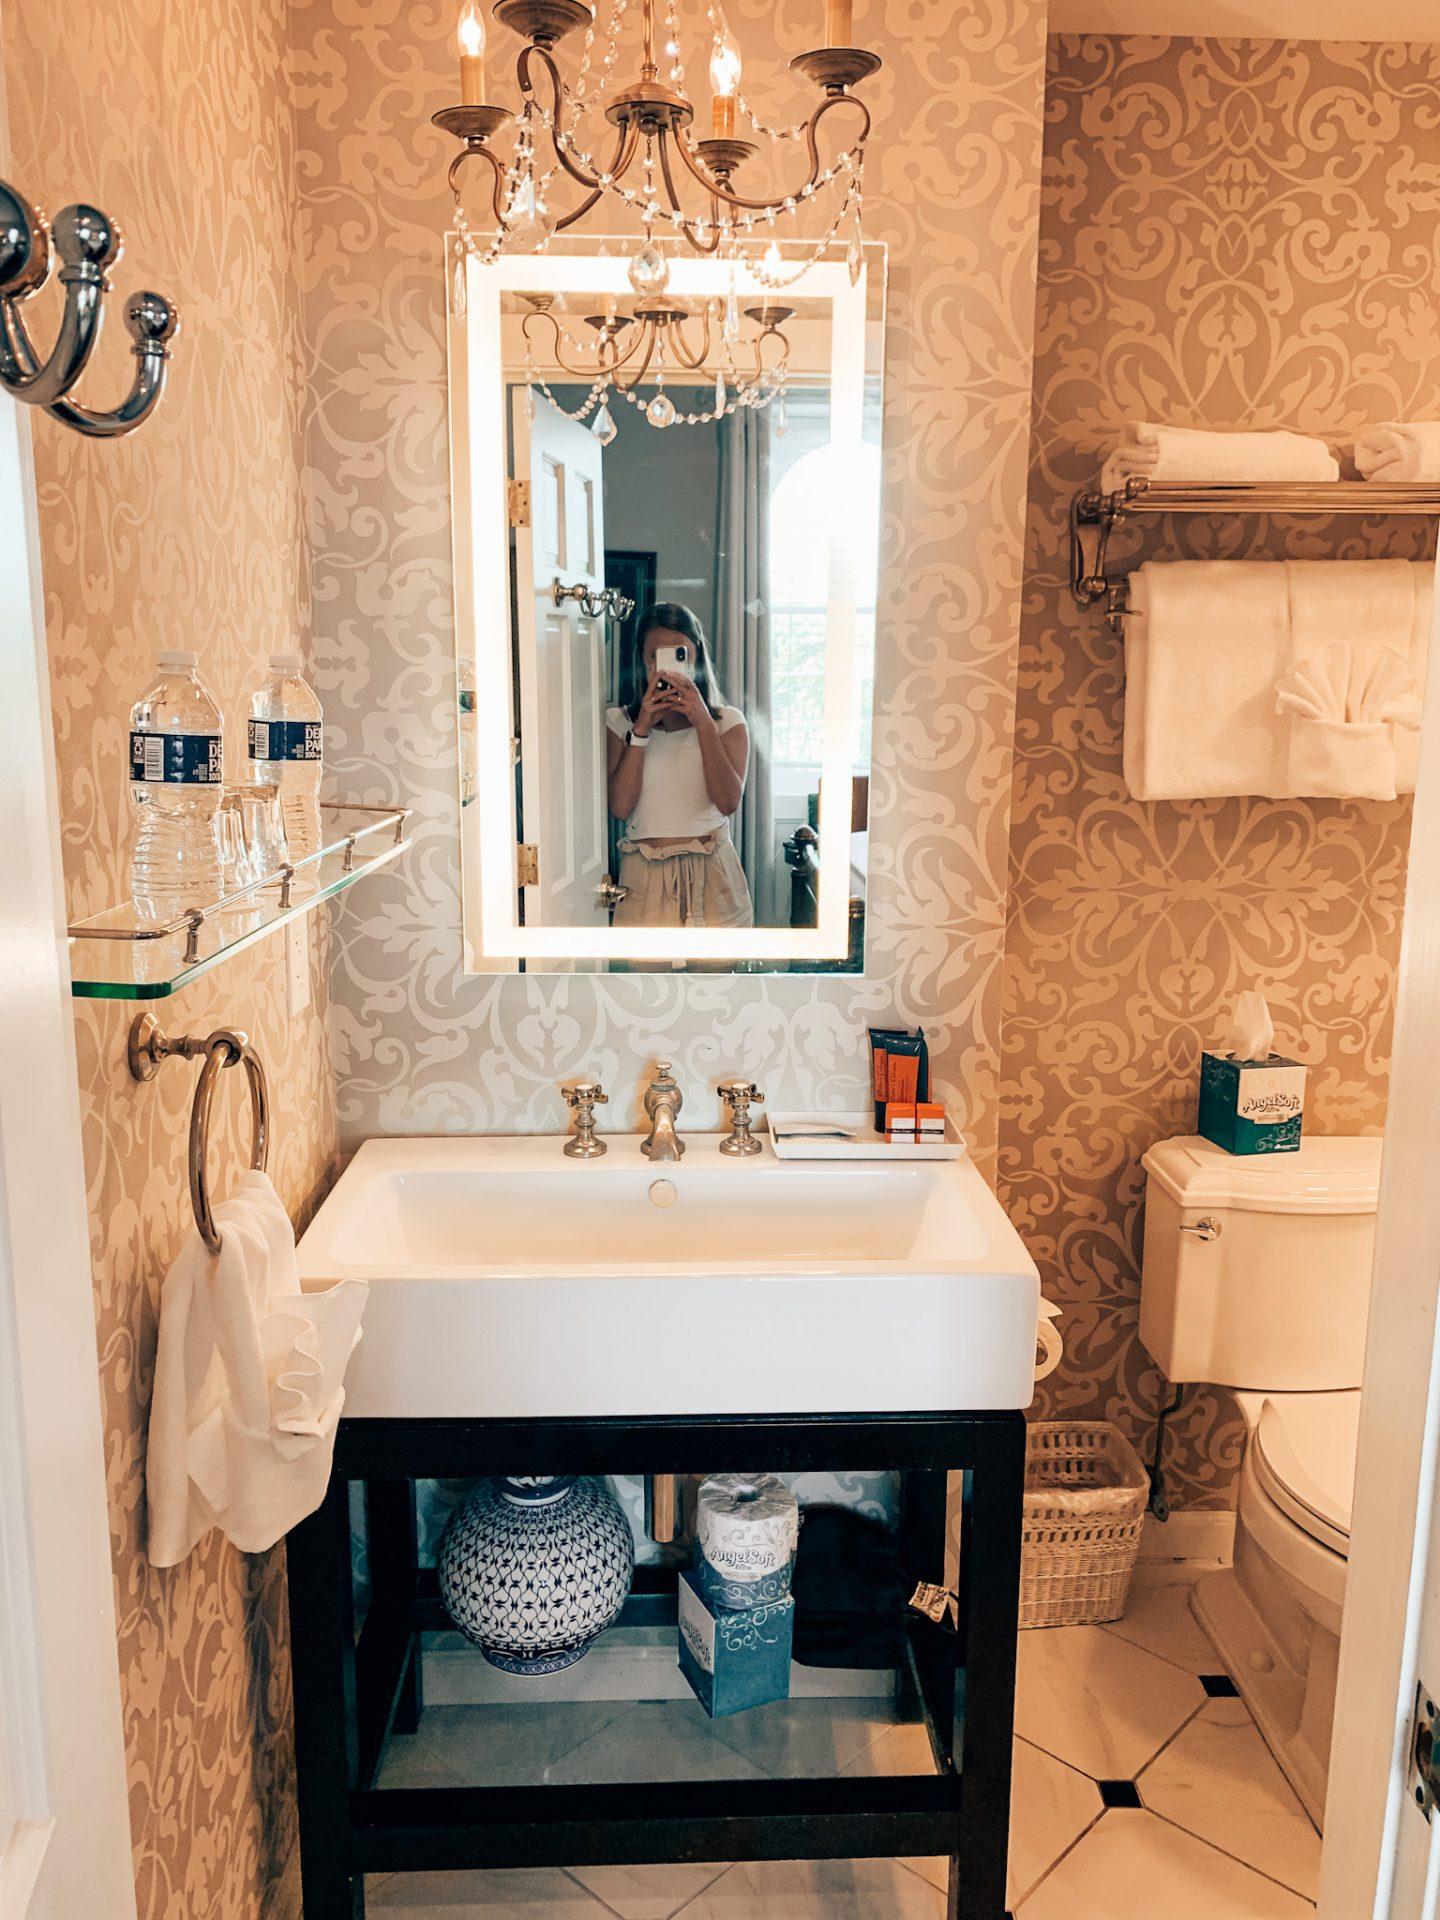 The bathroom at the Hamilton Turner Inn in Savannah, Georgia